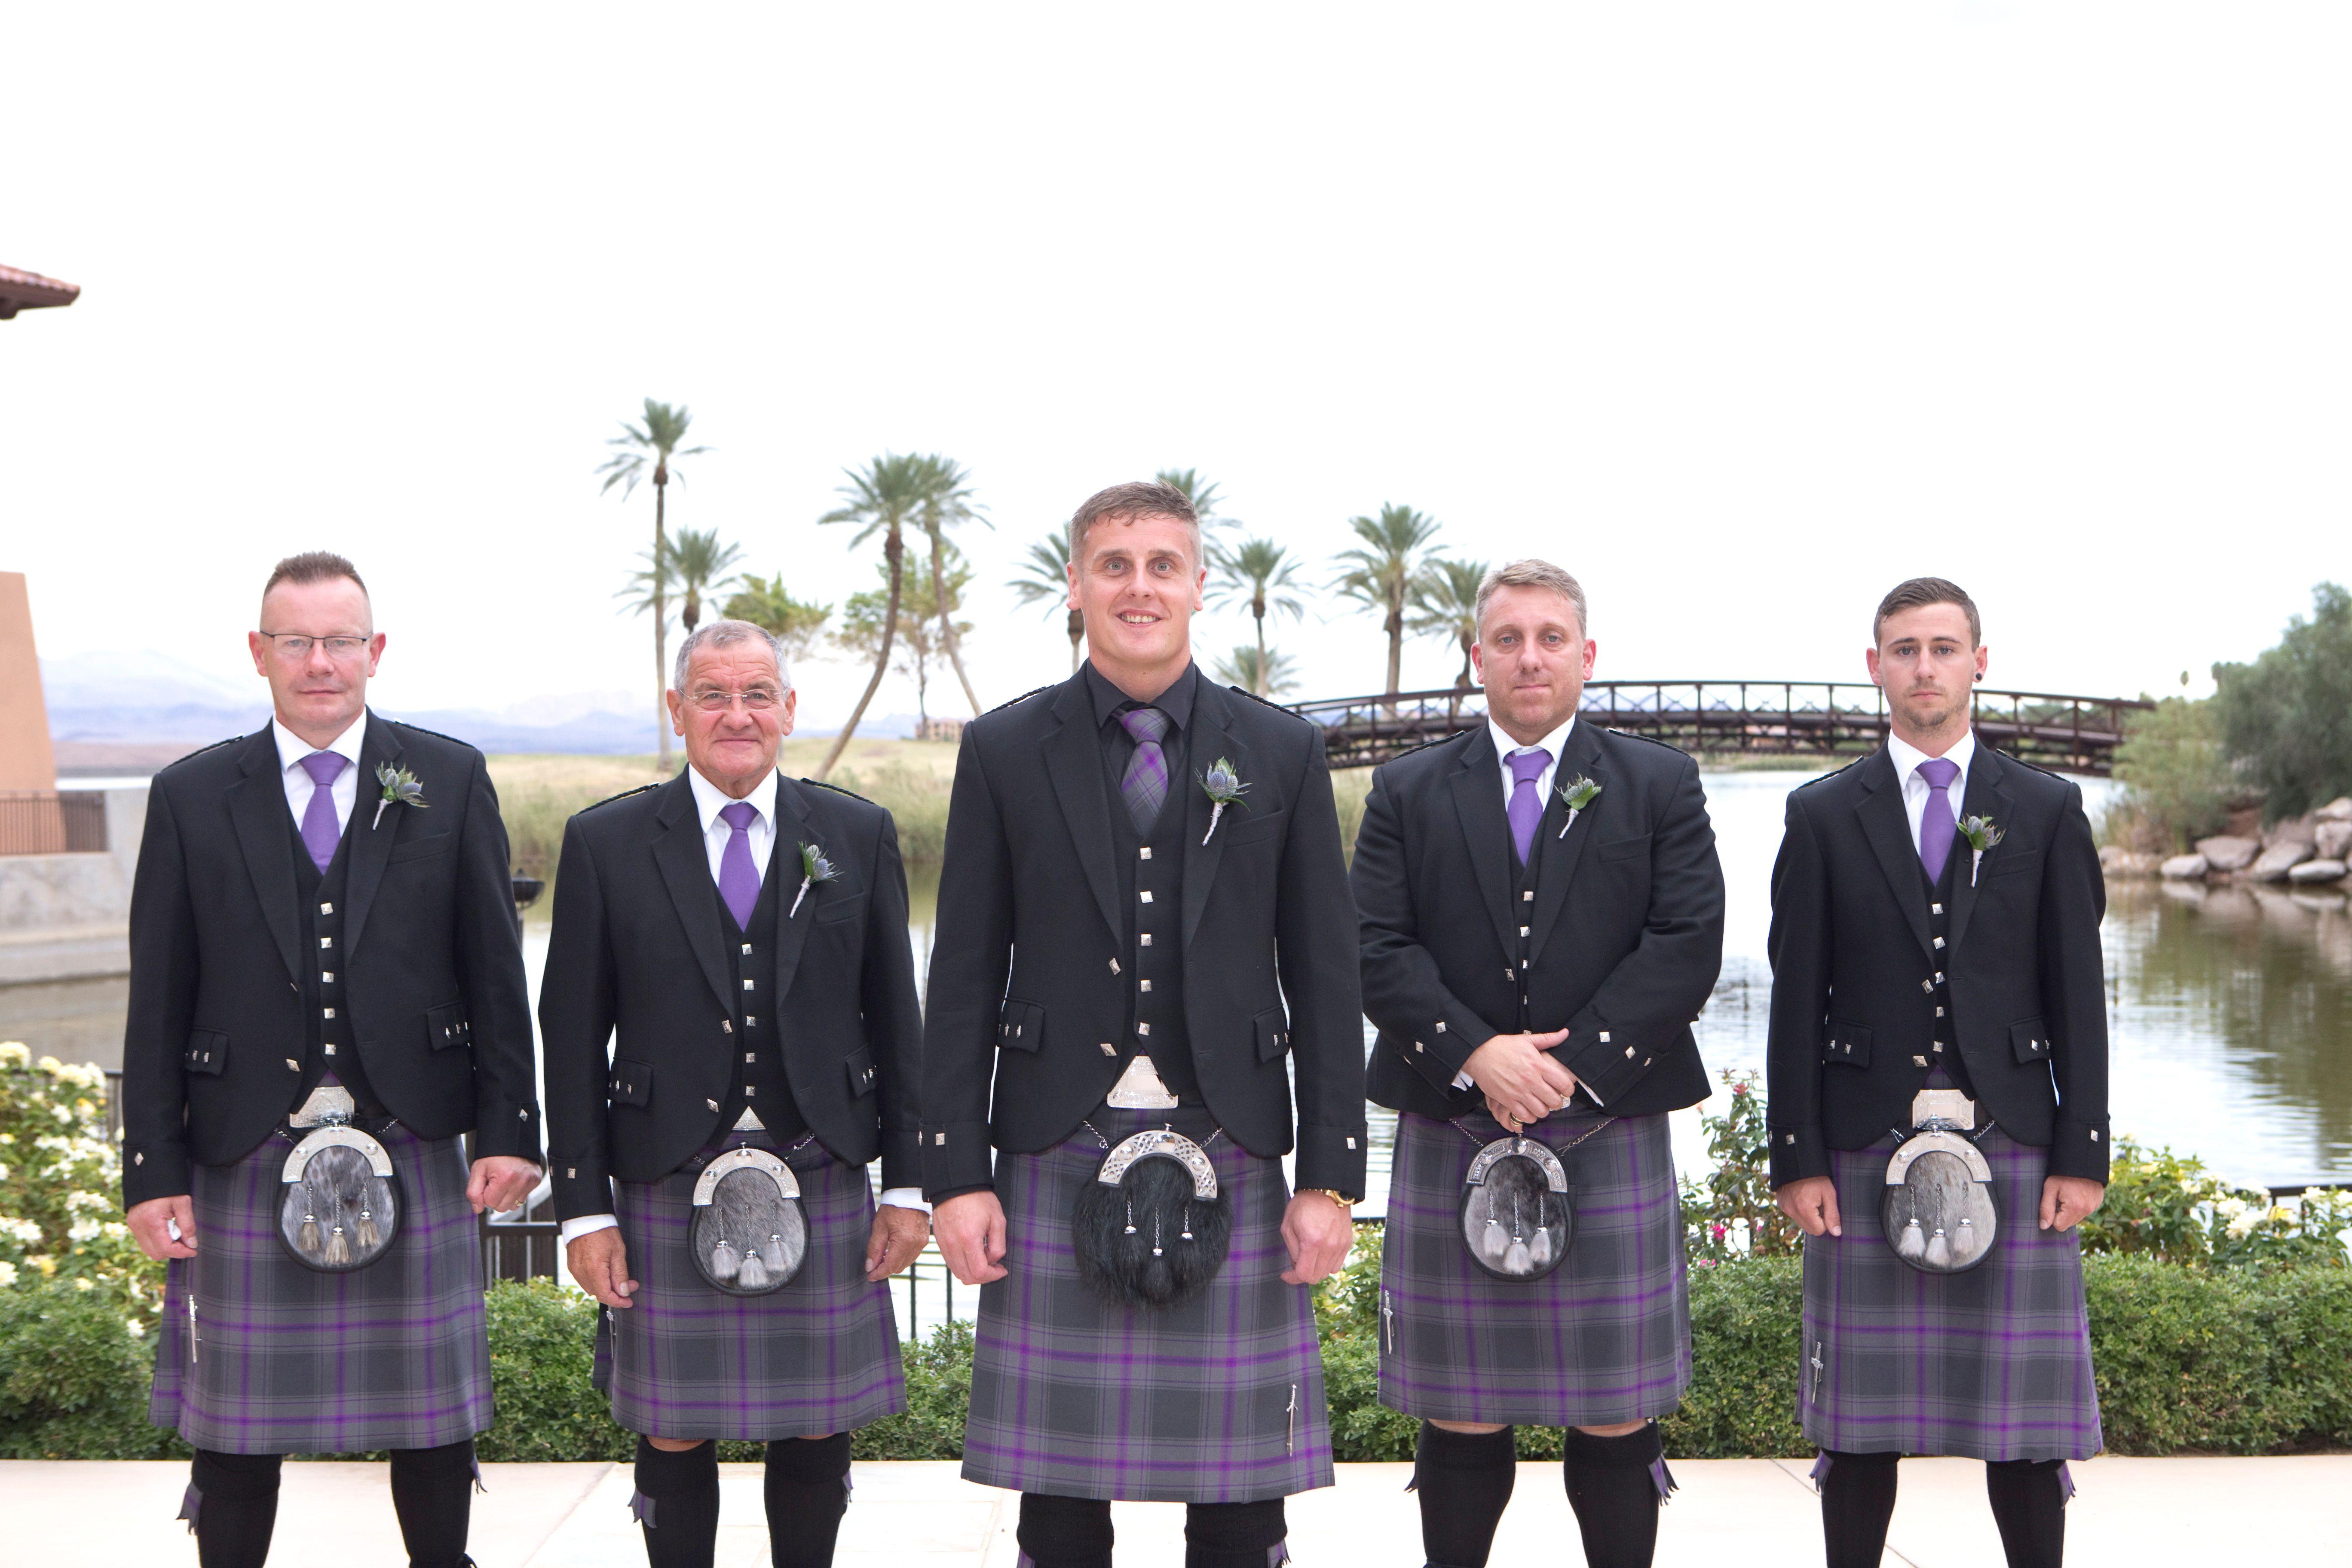 A Scottish wedding party at Lake Las Vegas. | Lake las ...